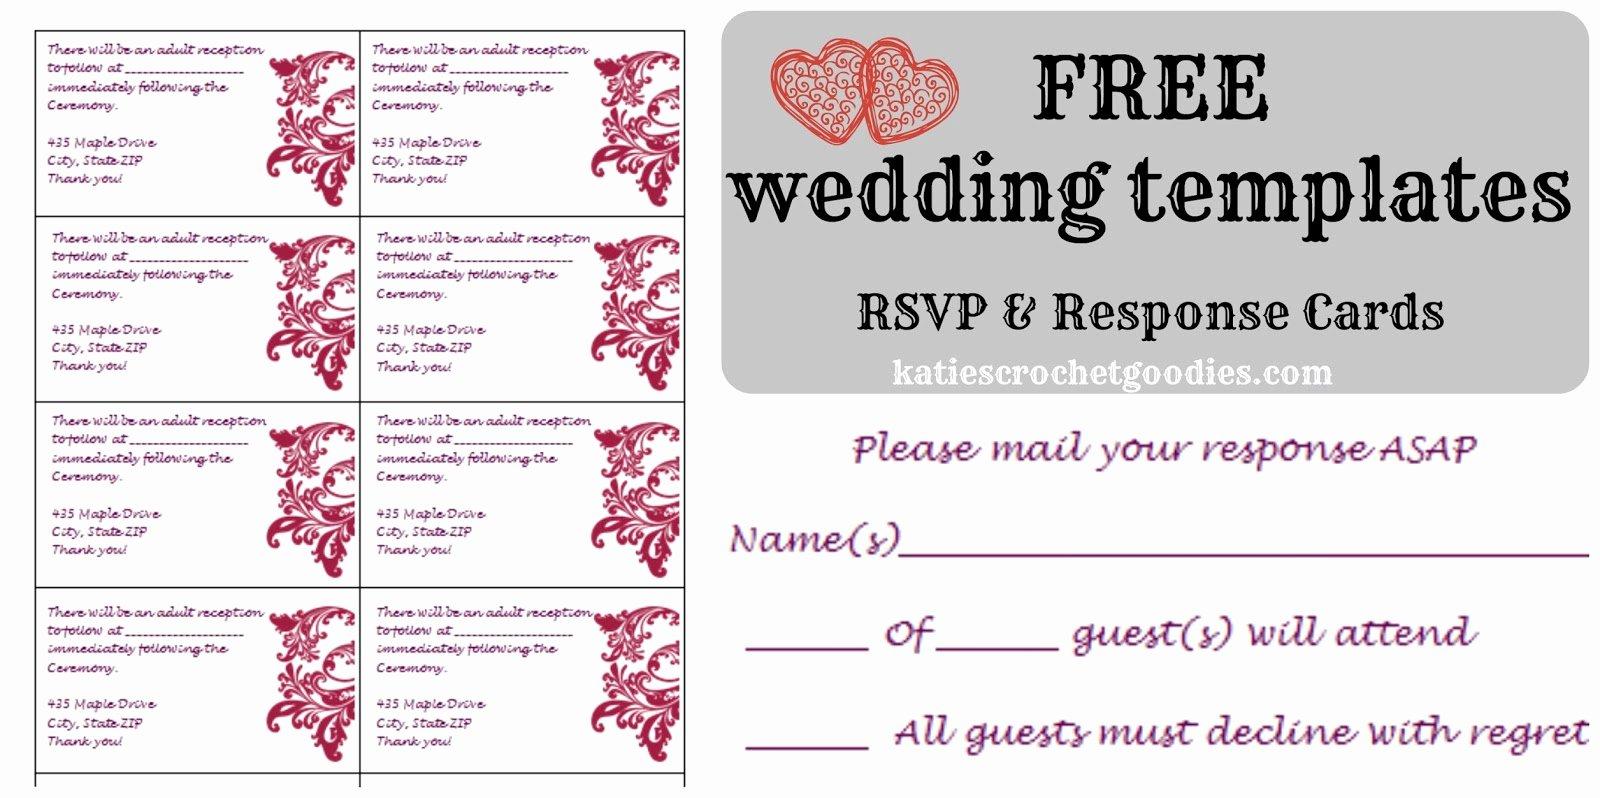 Rsvp Cards Template Free Elegant Free Wedding Templates Rsvp & Reception Cards Katie S